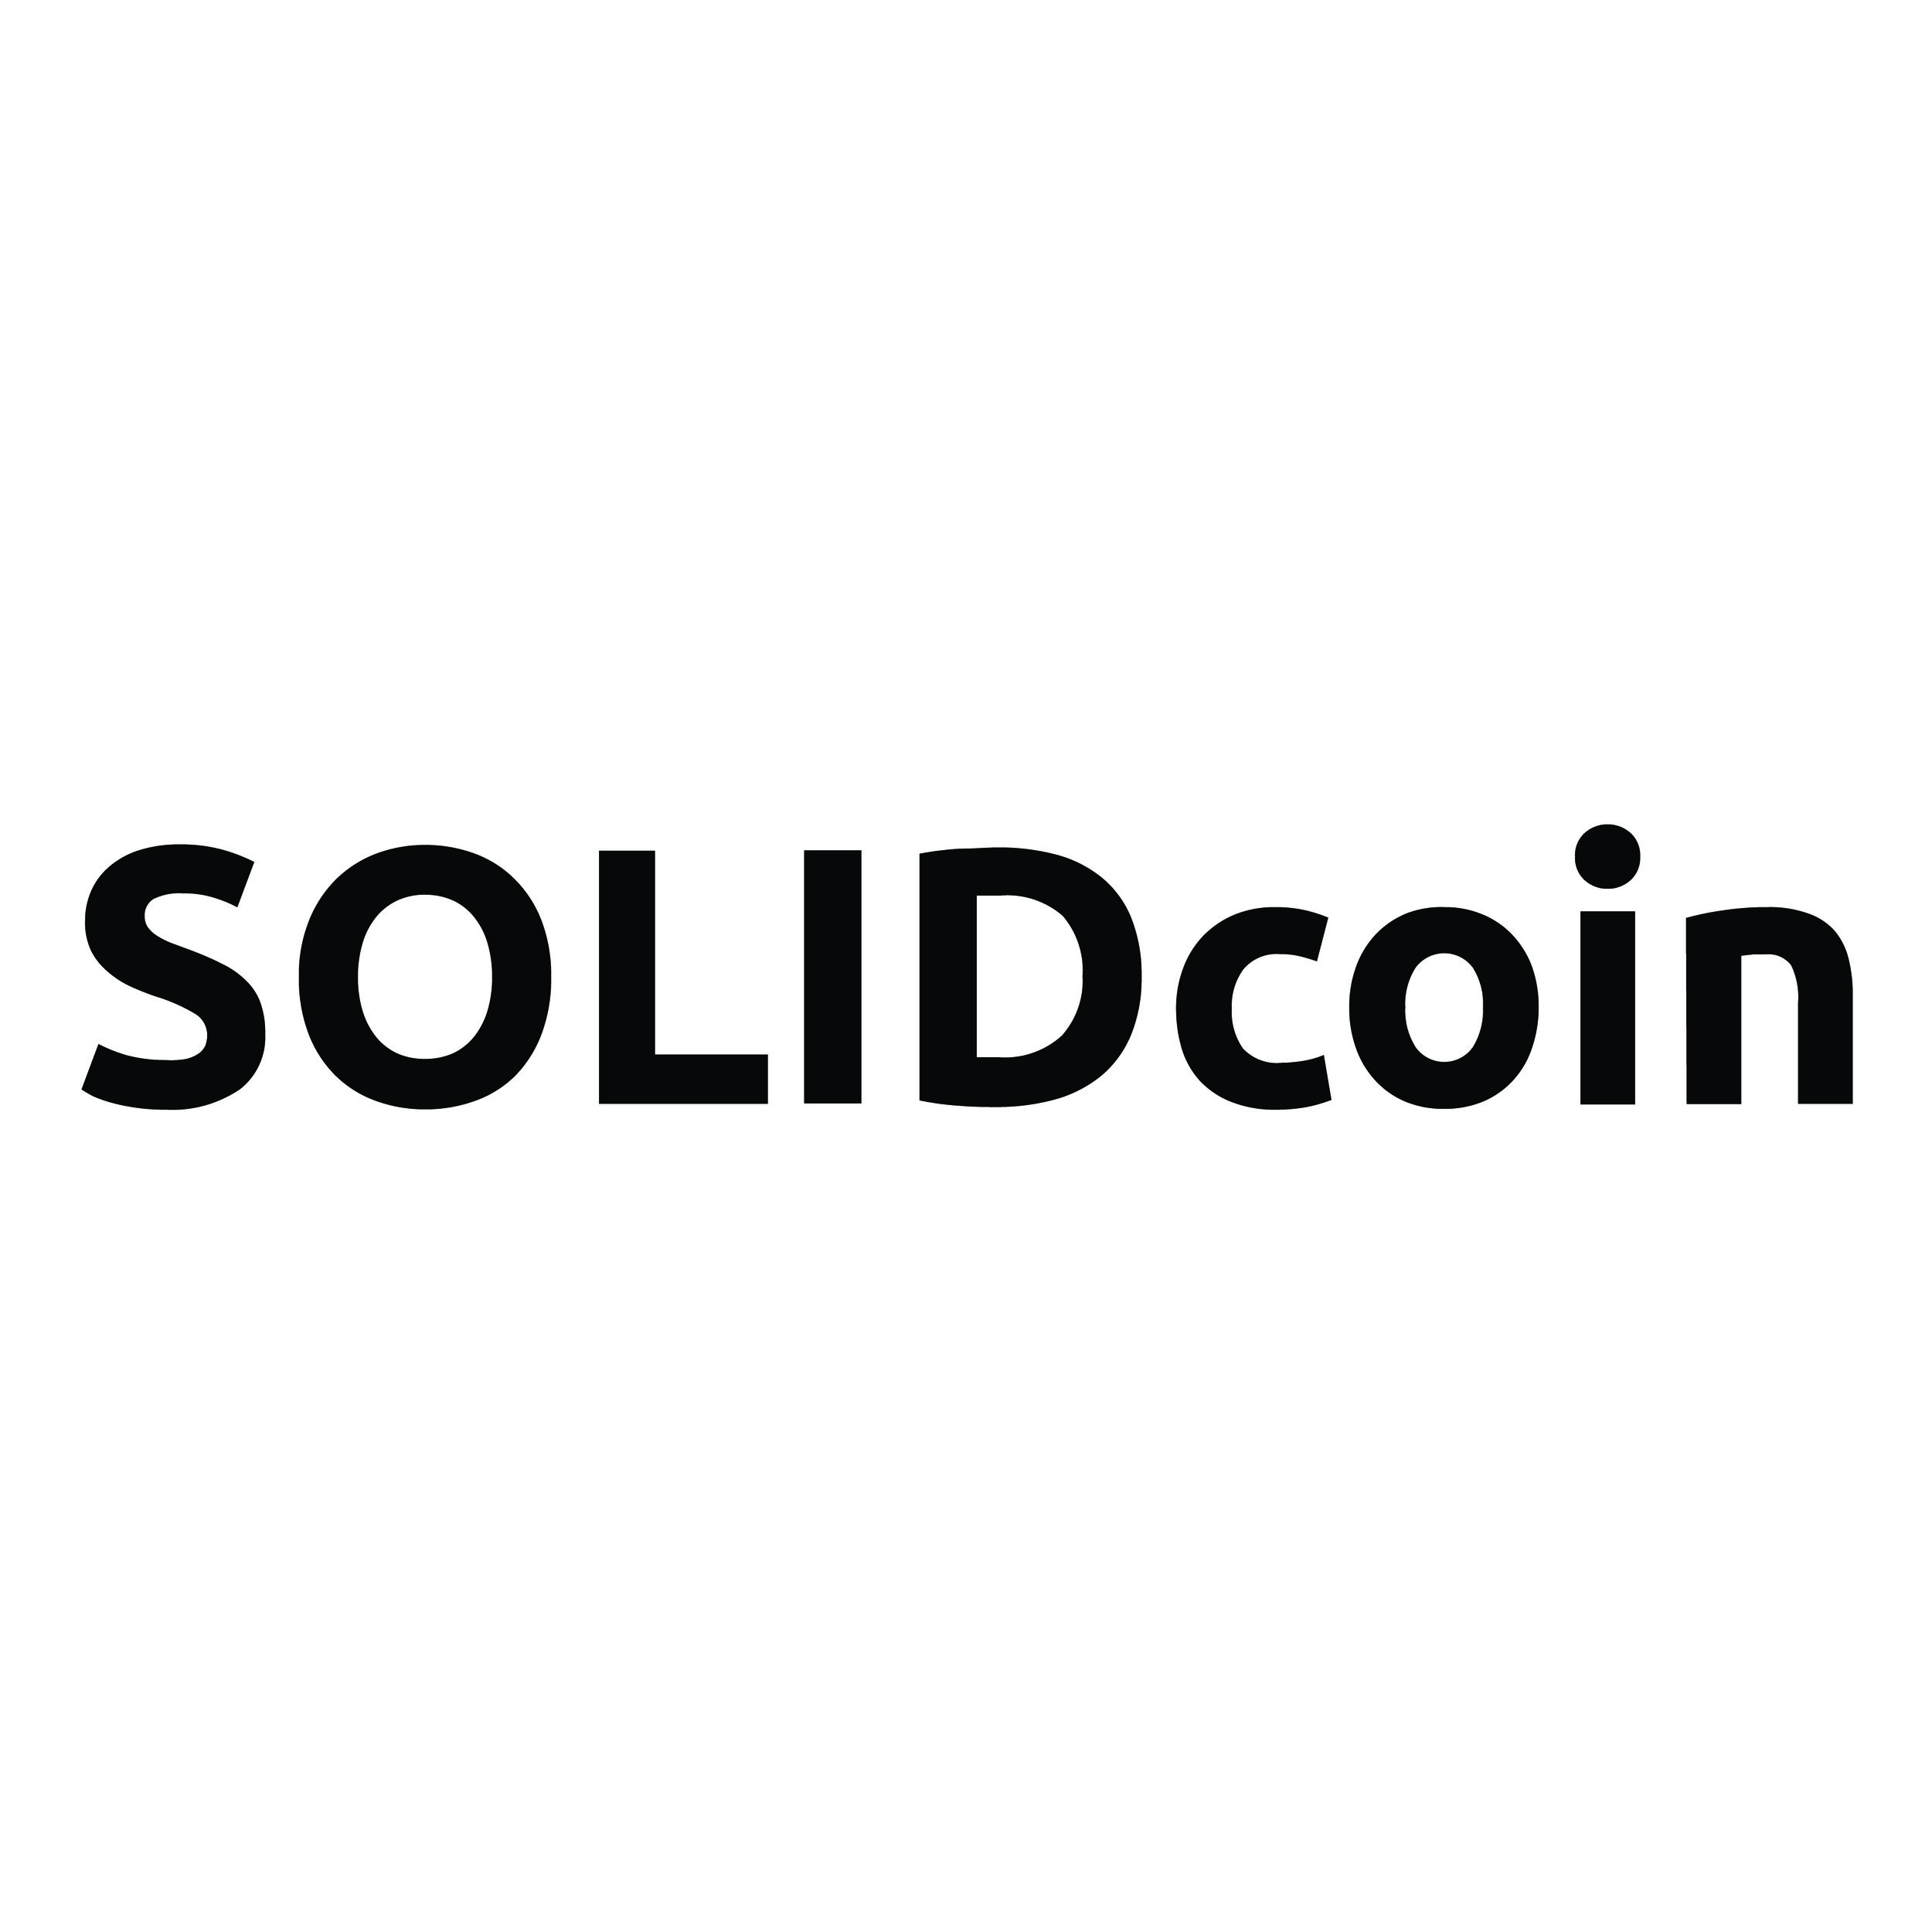 solidcoin-01.jpg